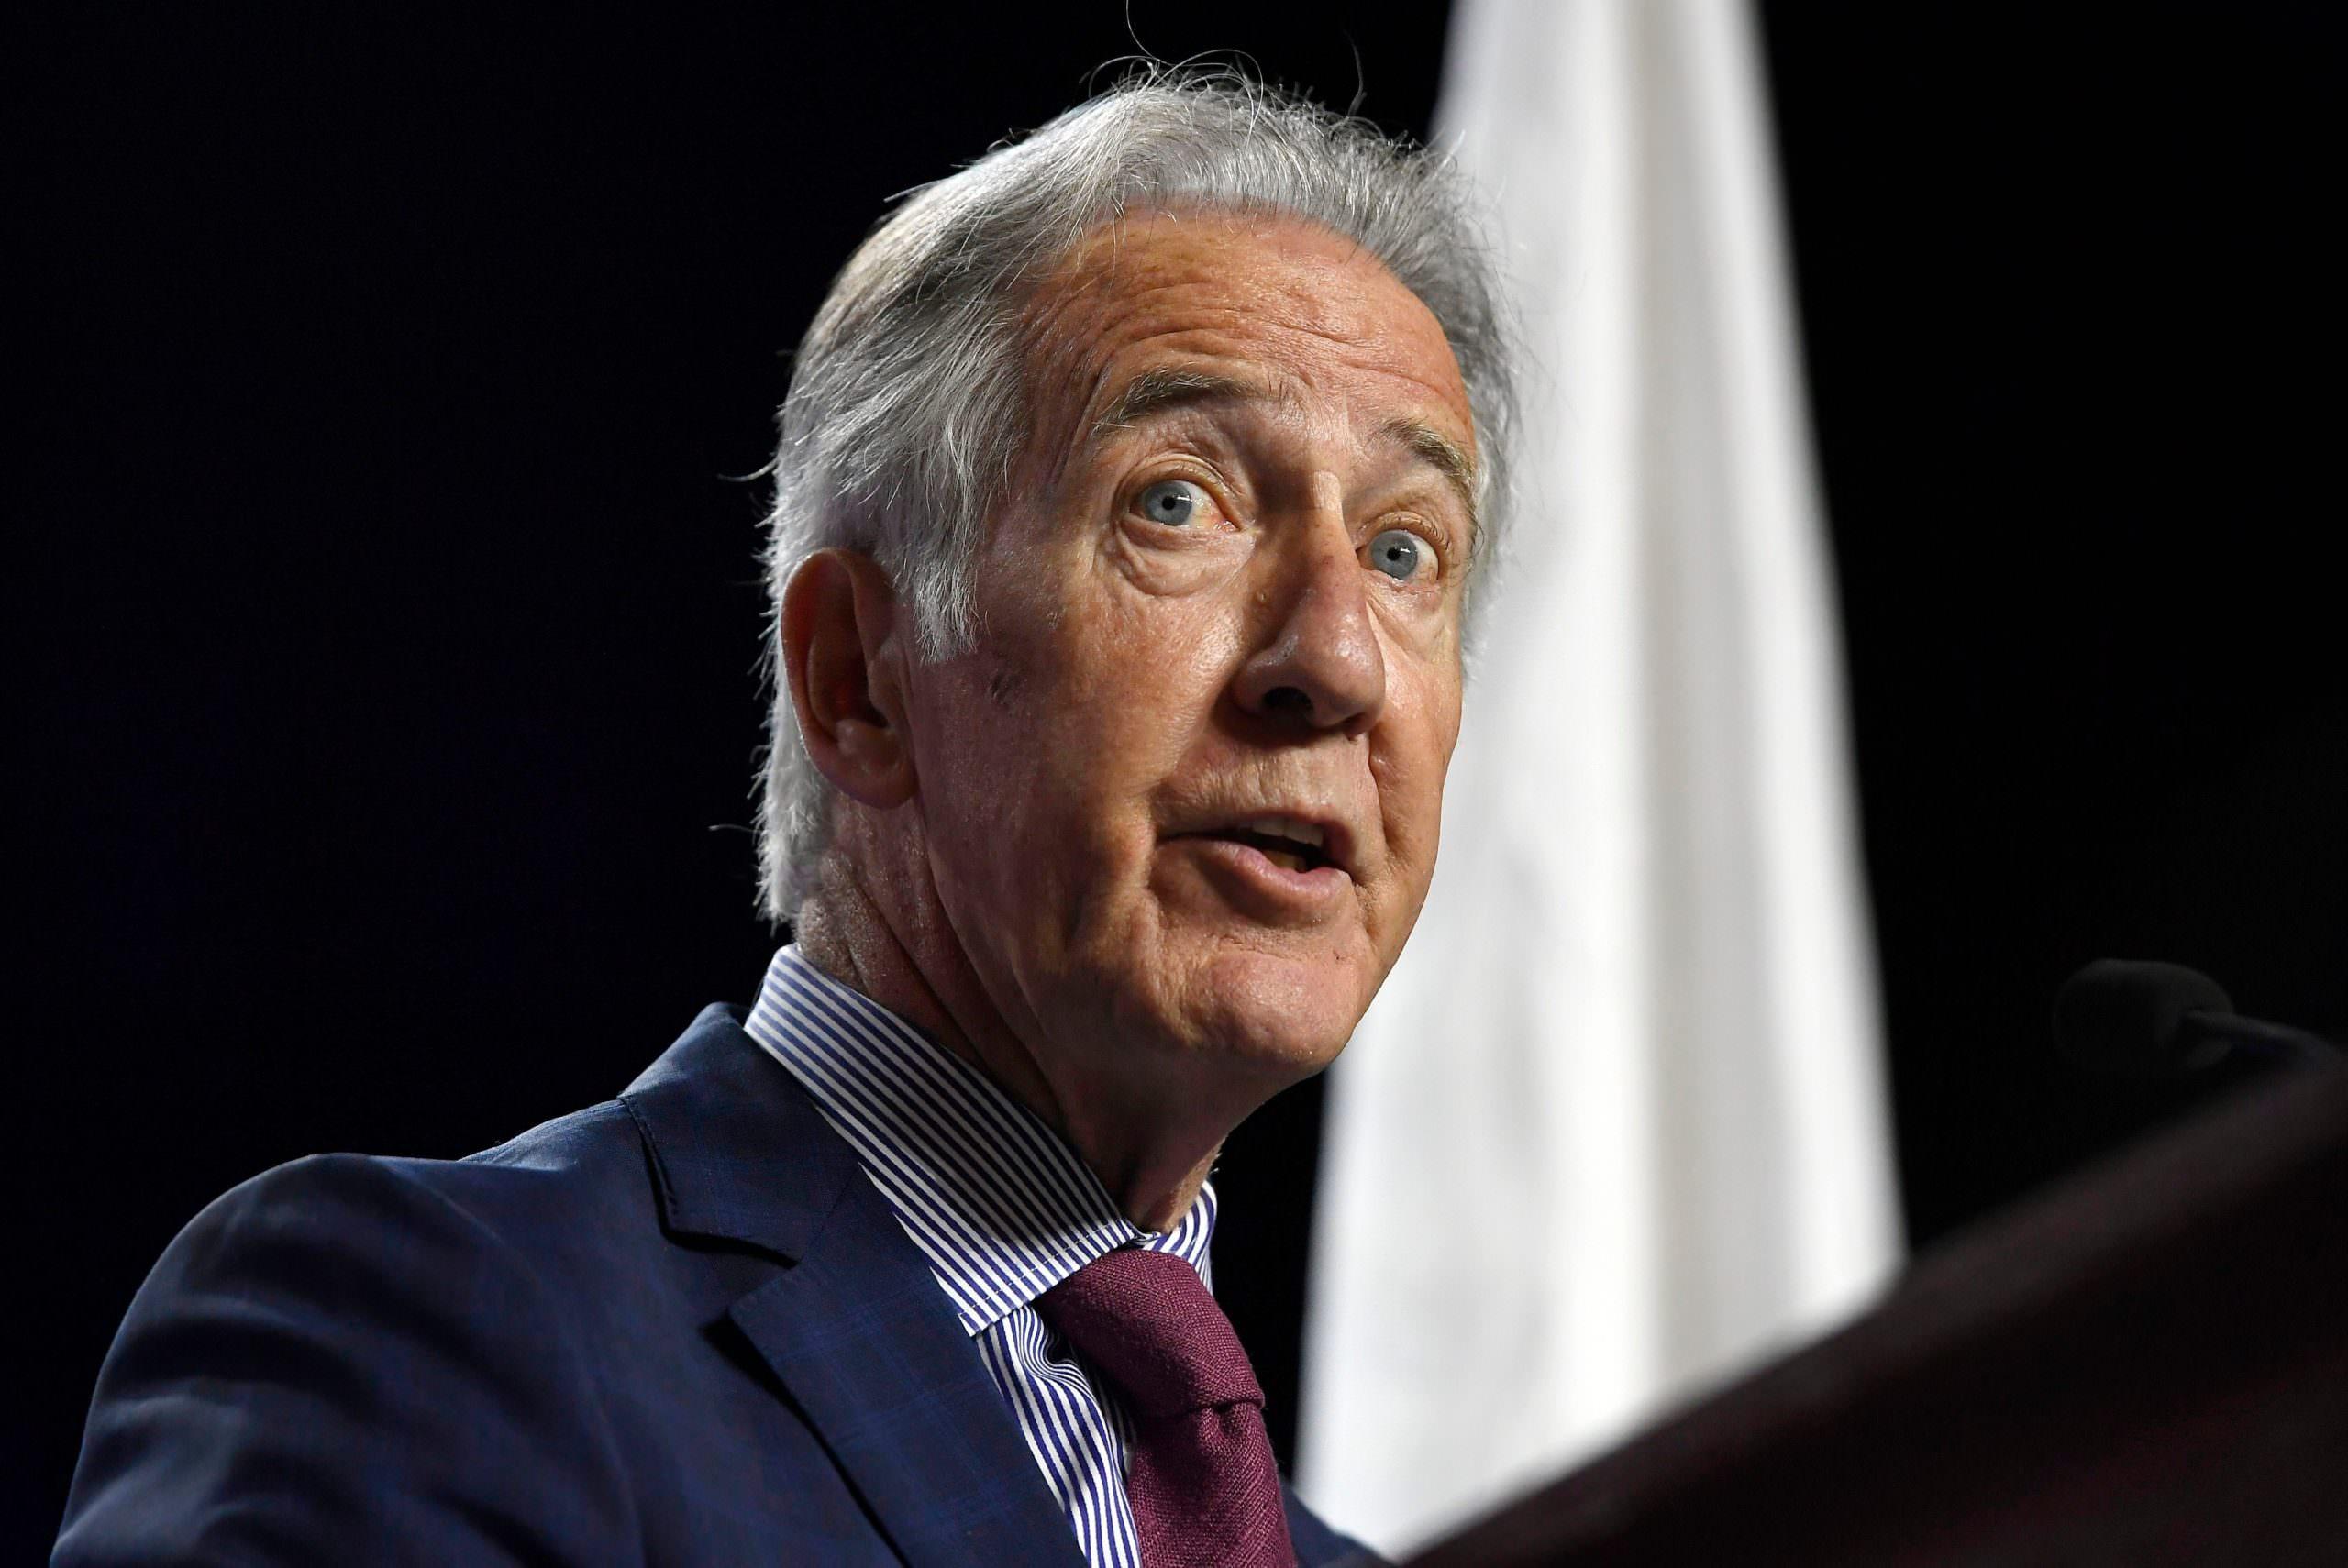 The Deep Rot do Partido Democrático de Massachusetts